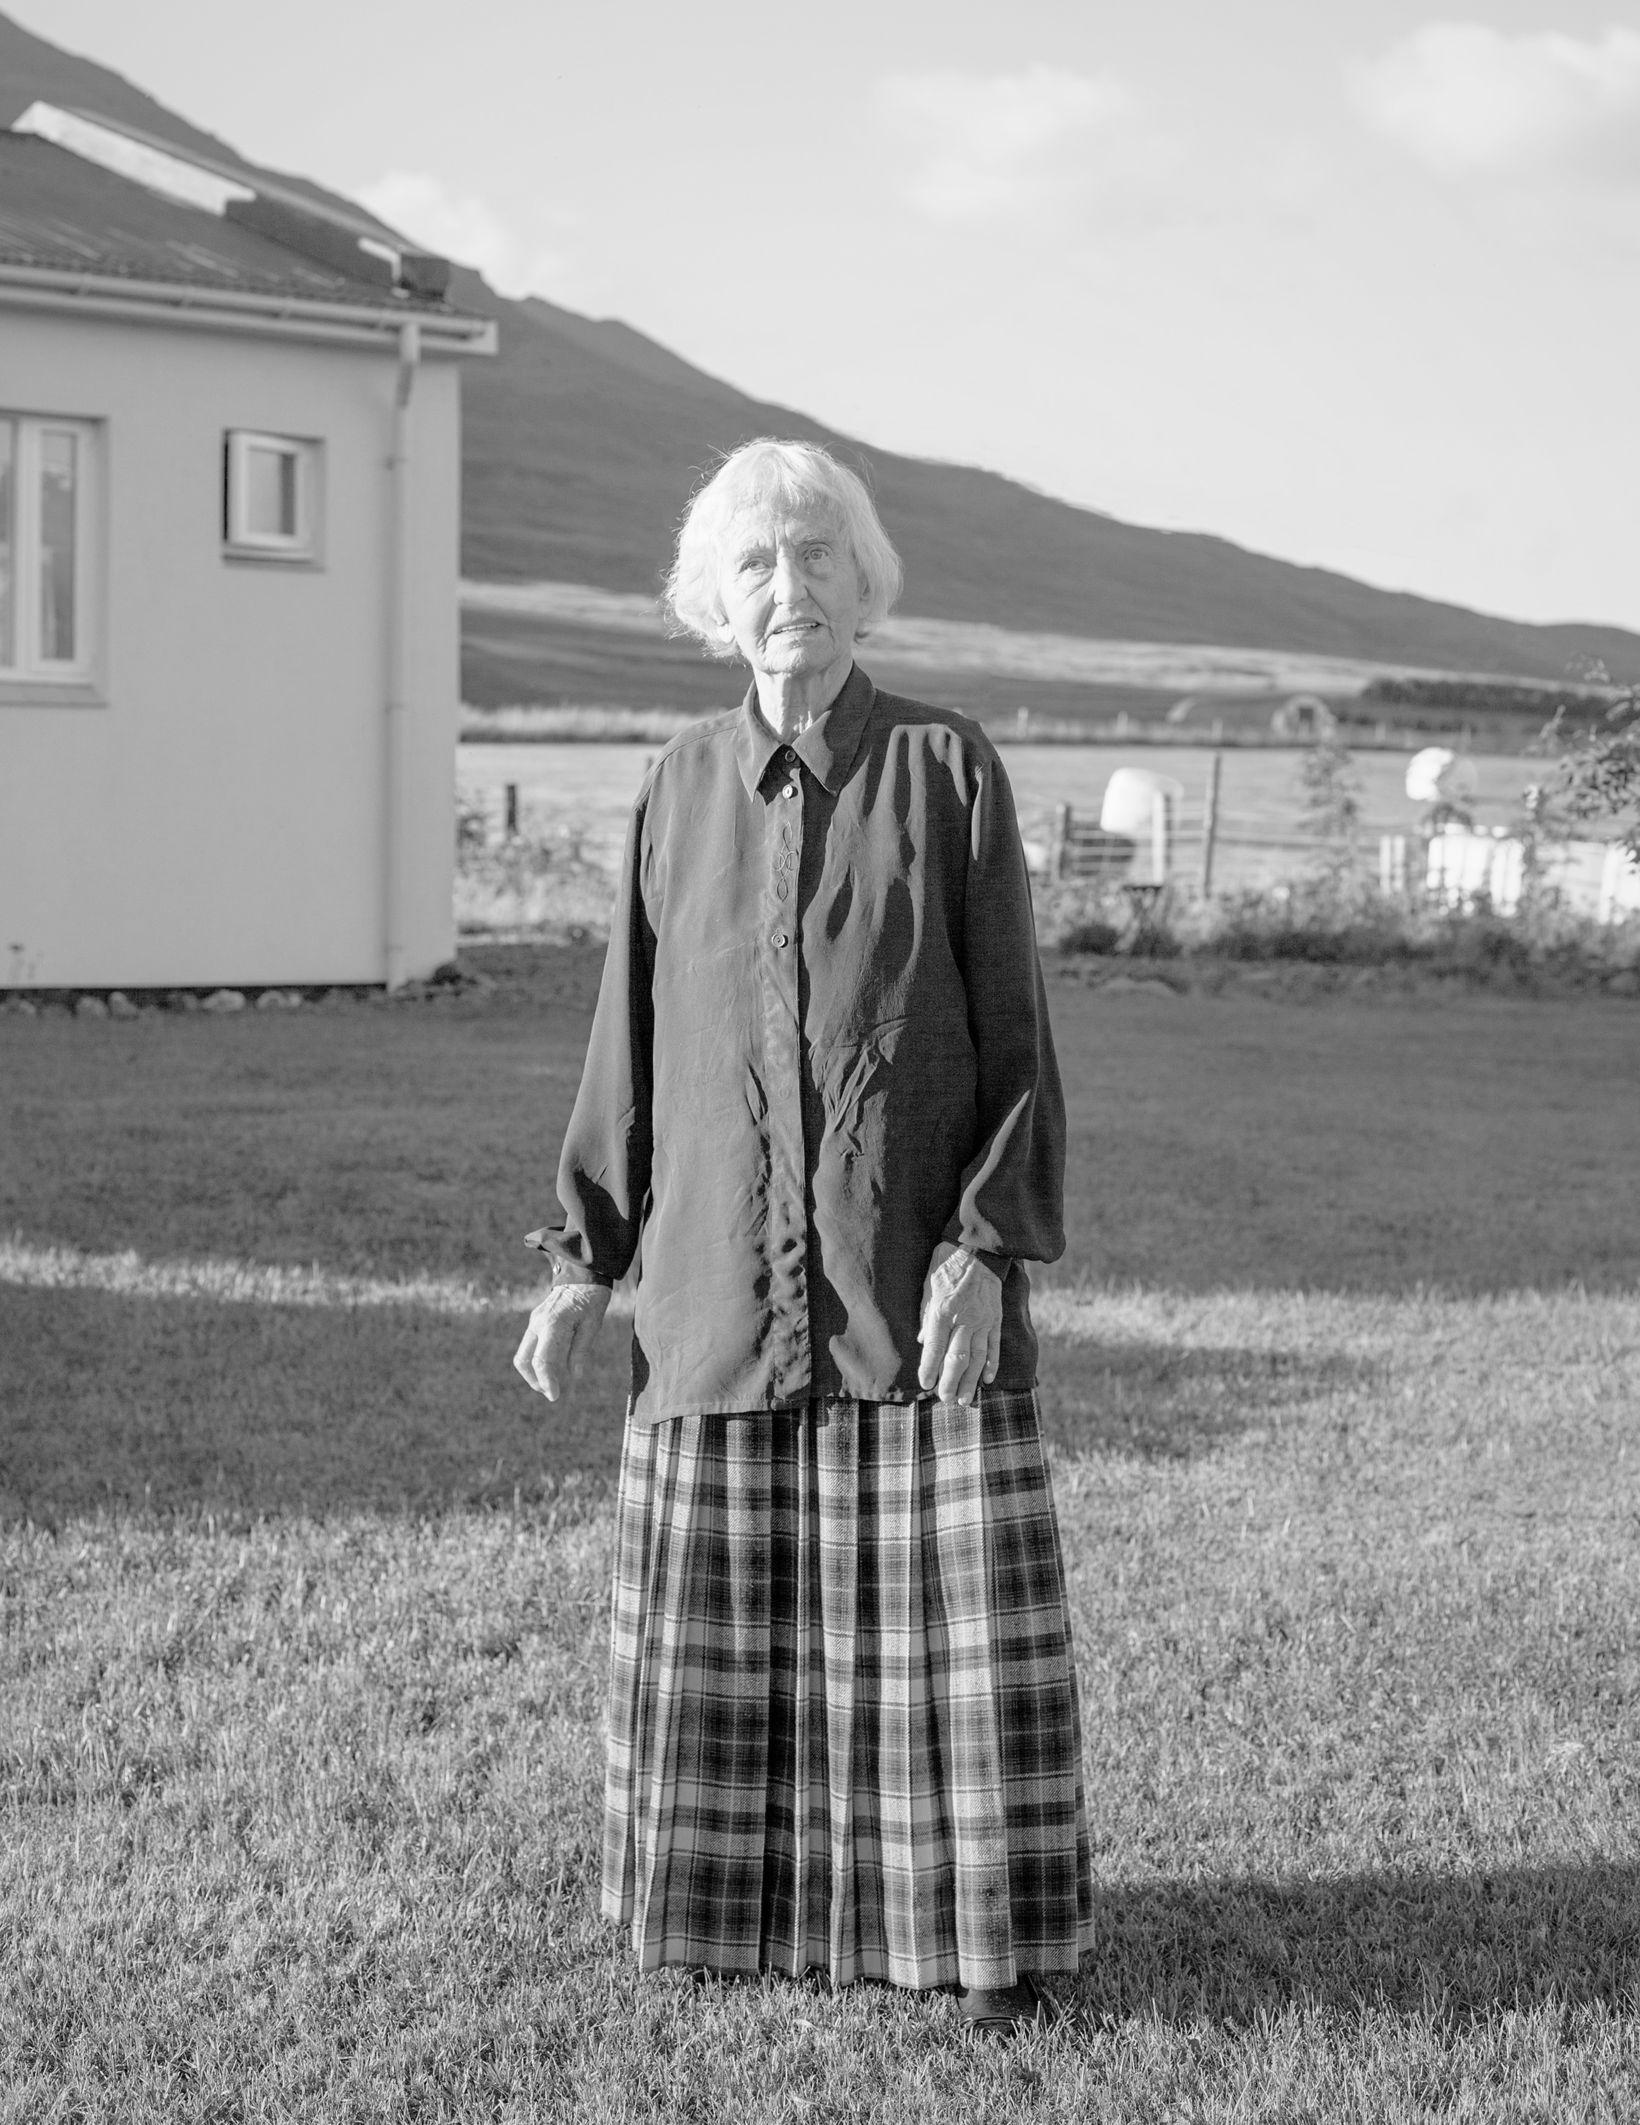 From the work HEIMAt. Ingbjörg Pálsdóttir, 2013.